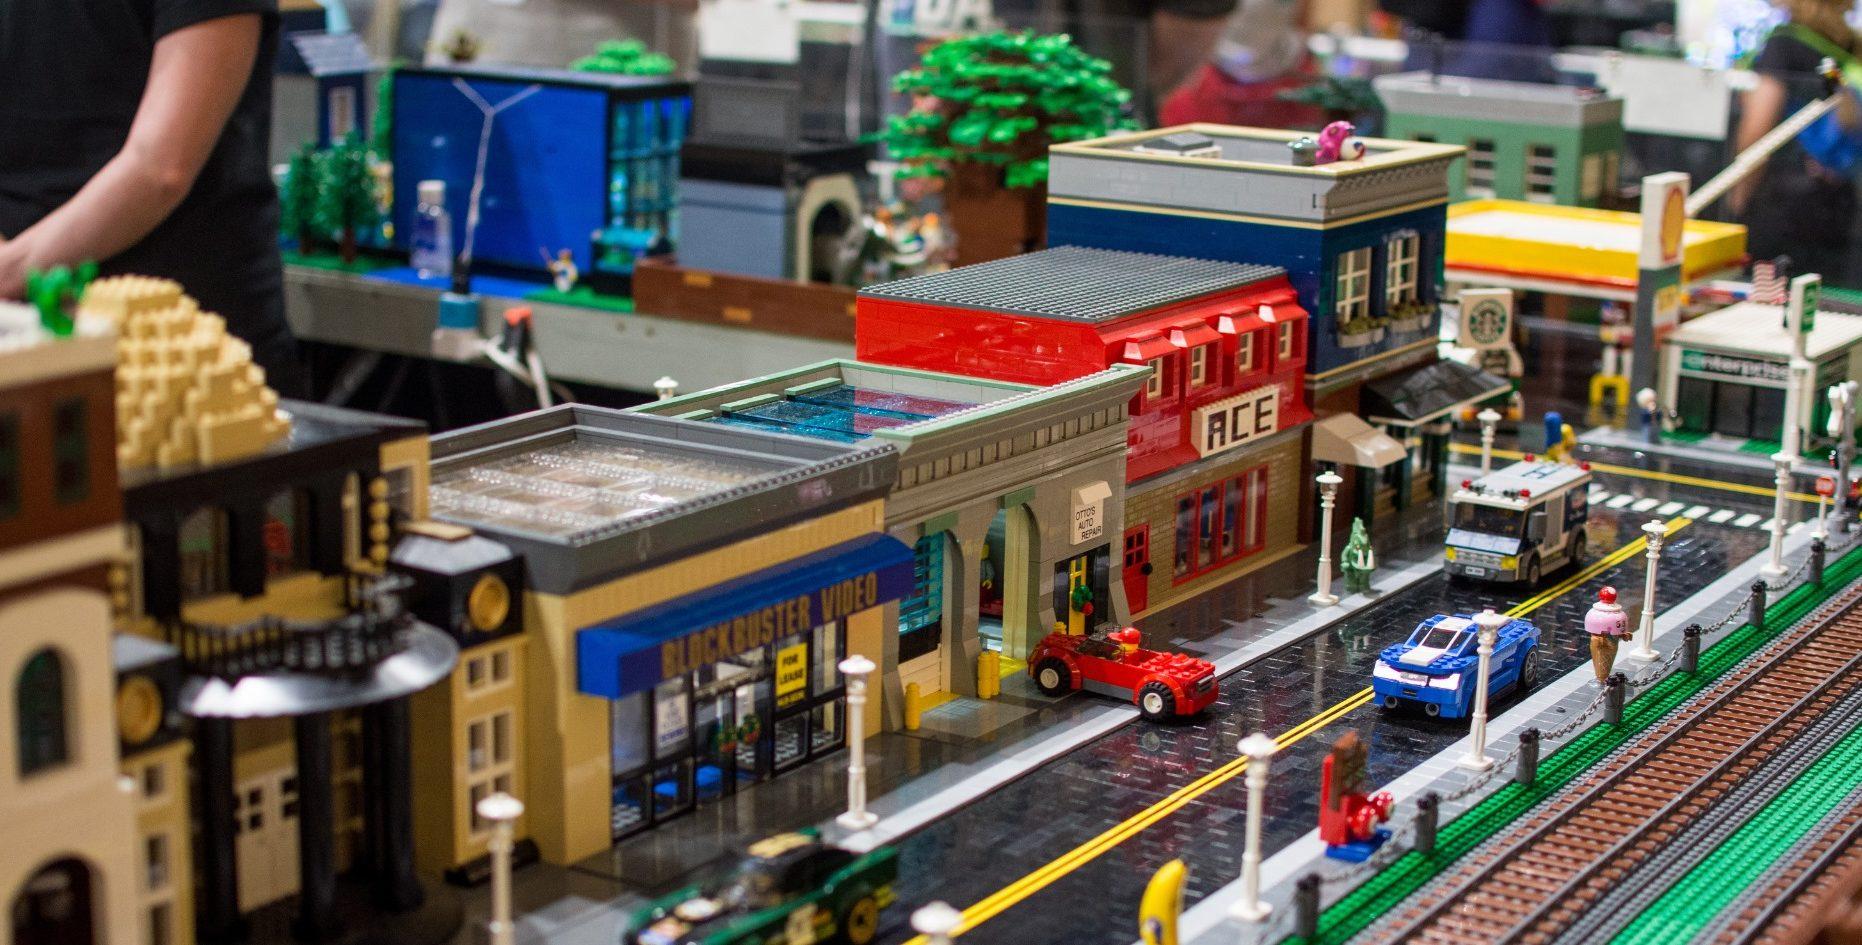 Brickworld LEGO display